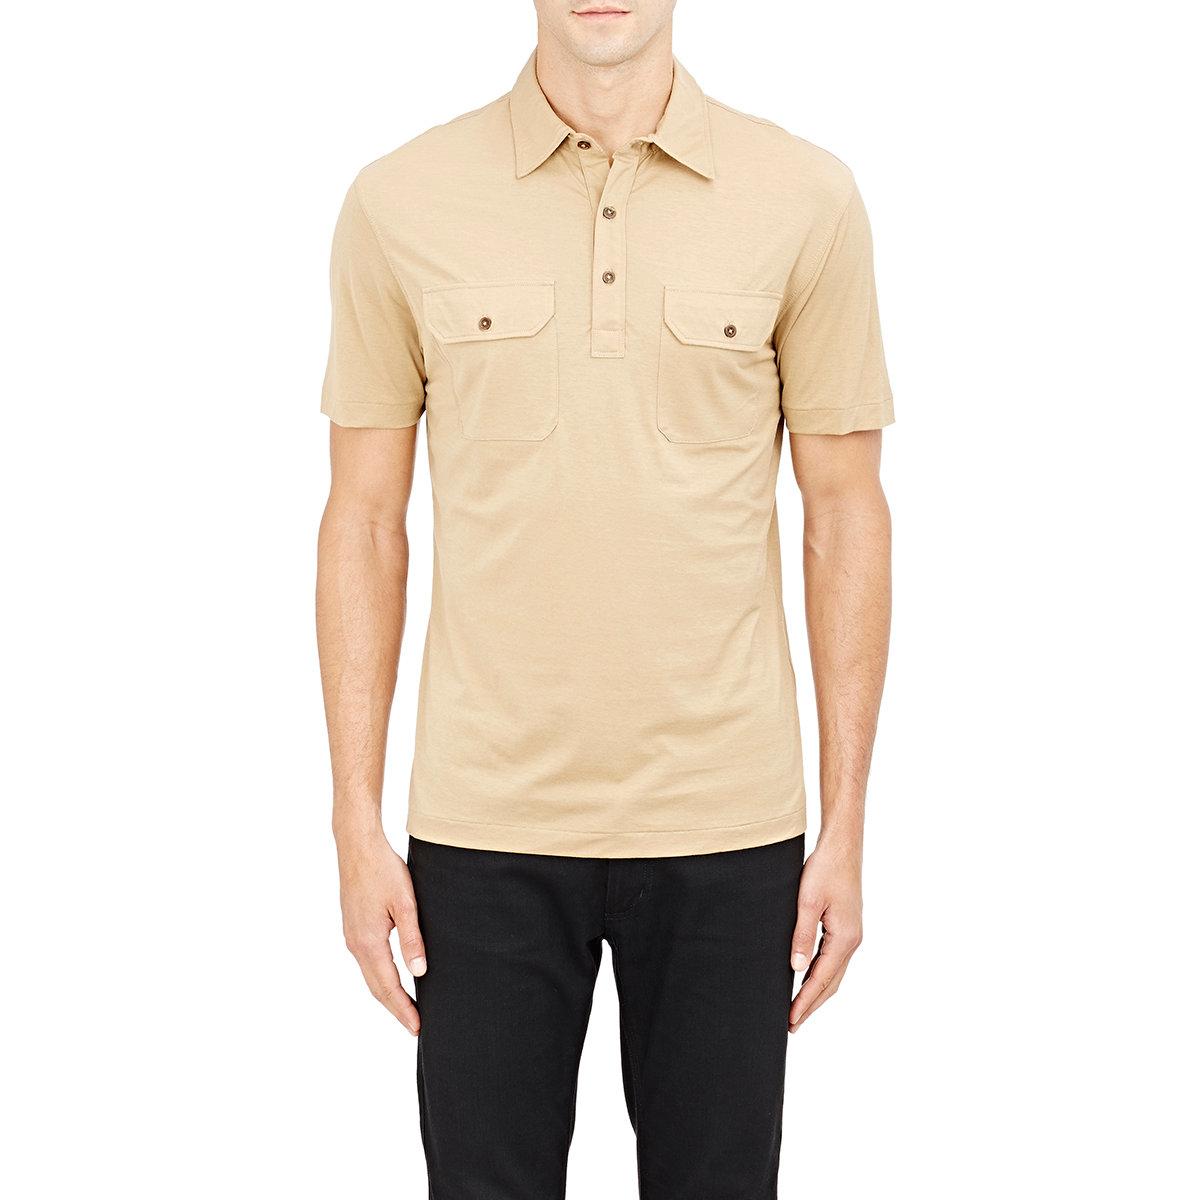 Lyst ralph lauren black label jersey polo shirt in for Ralph lauren black label polo shirt